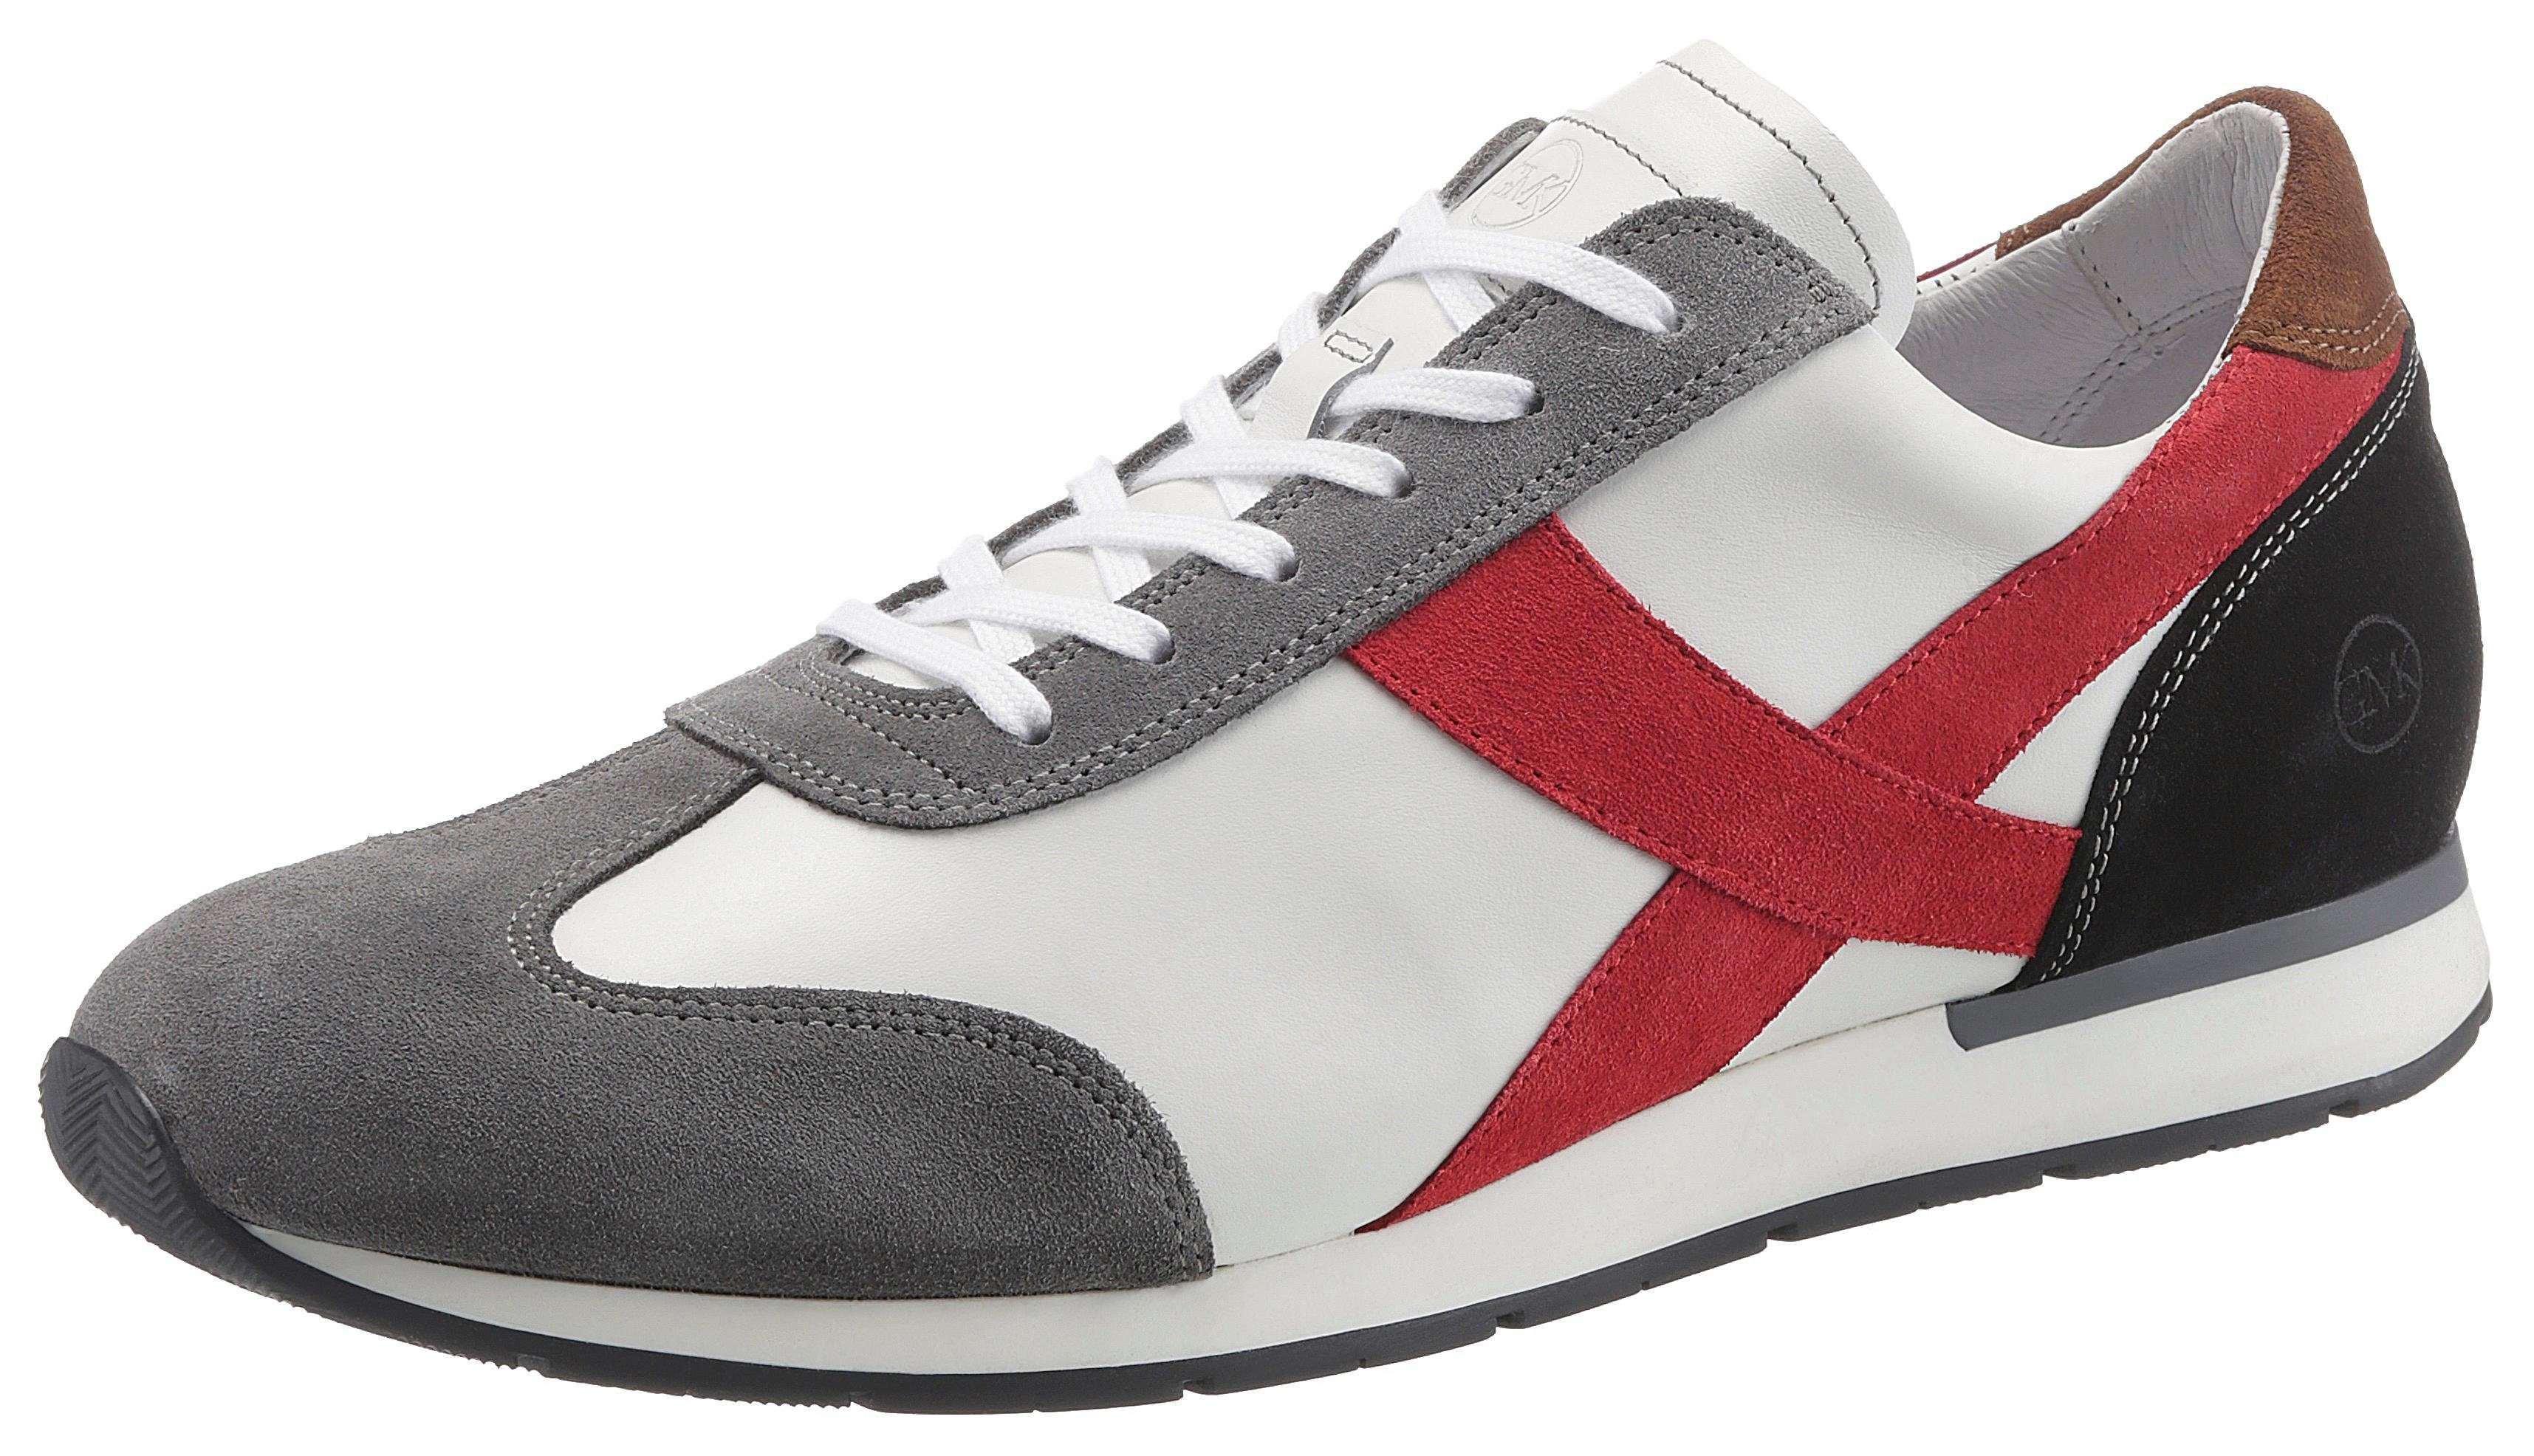 GUIDO MARIA KRETSCHMER Sneaker, Trendiger Sneaker in modischer Farbkombi online kaufen | OTTO